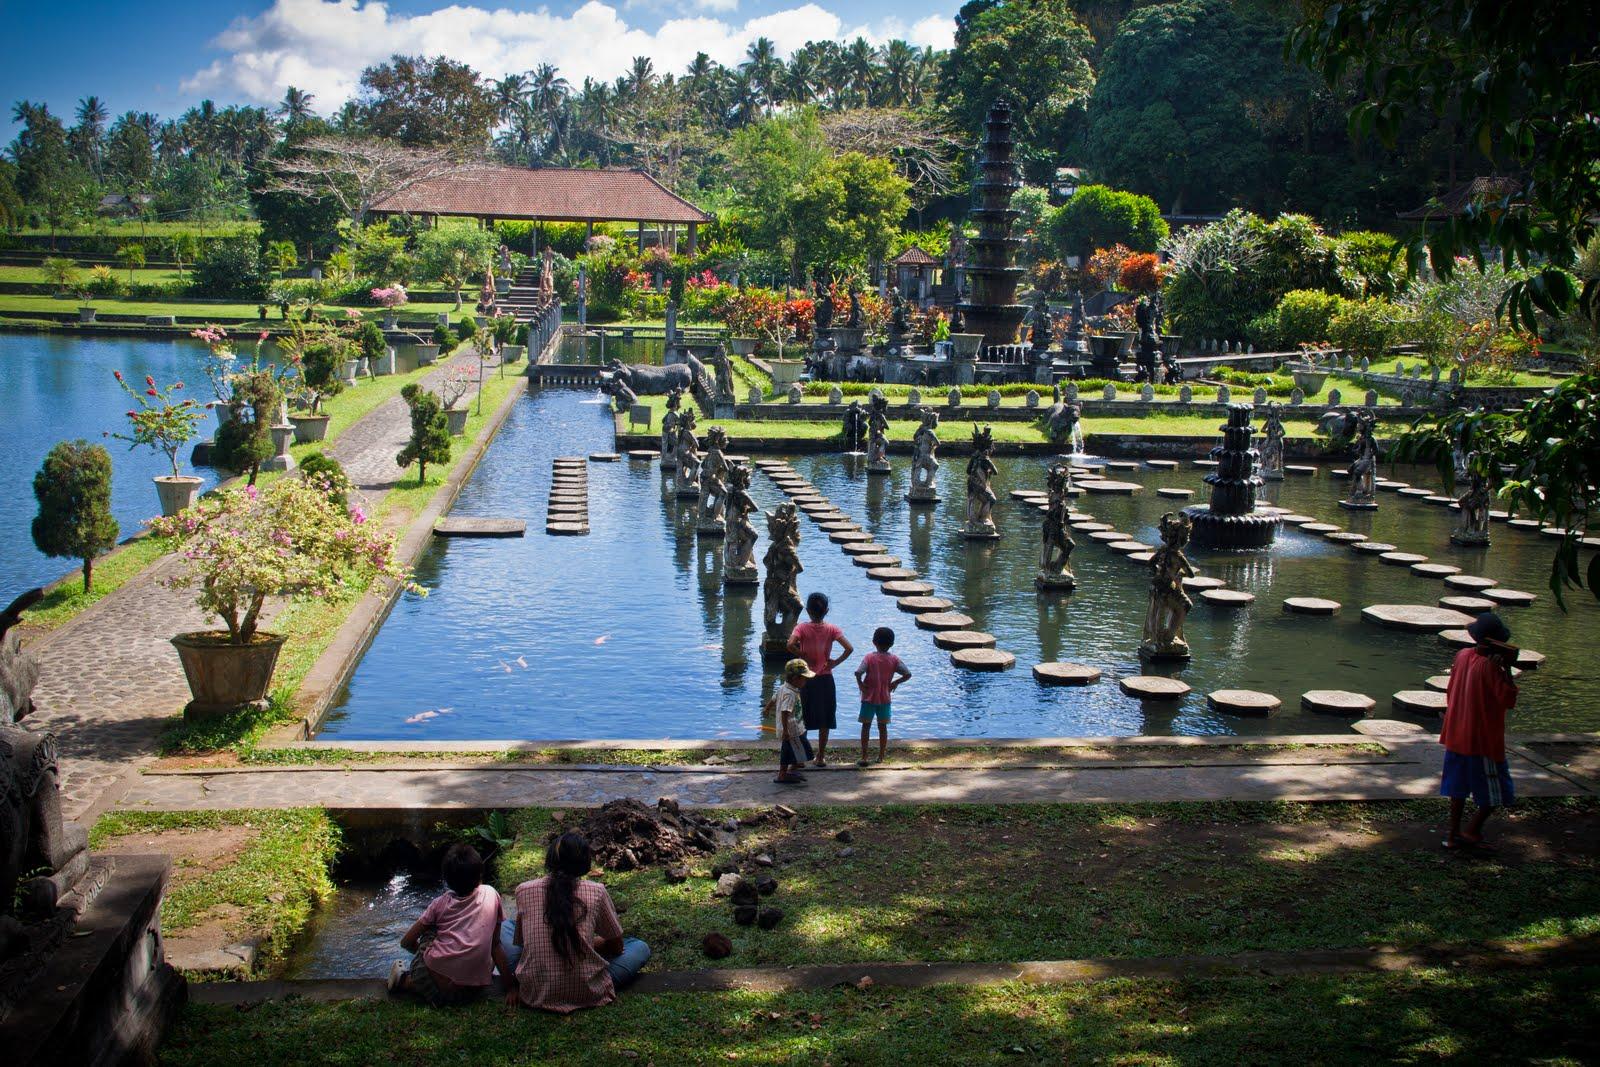 Khu tham quan tại Water Bom Bali